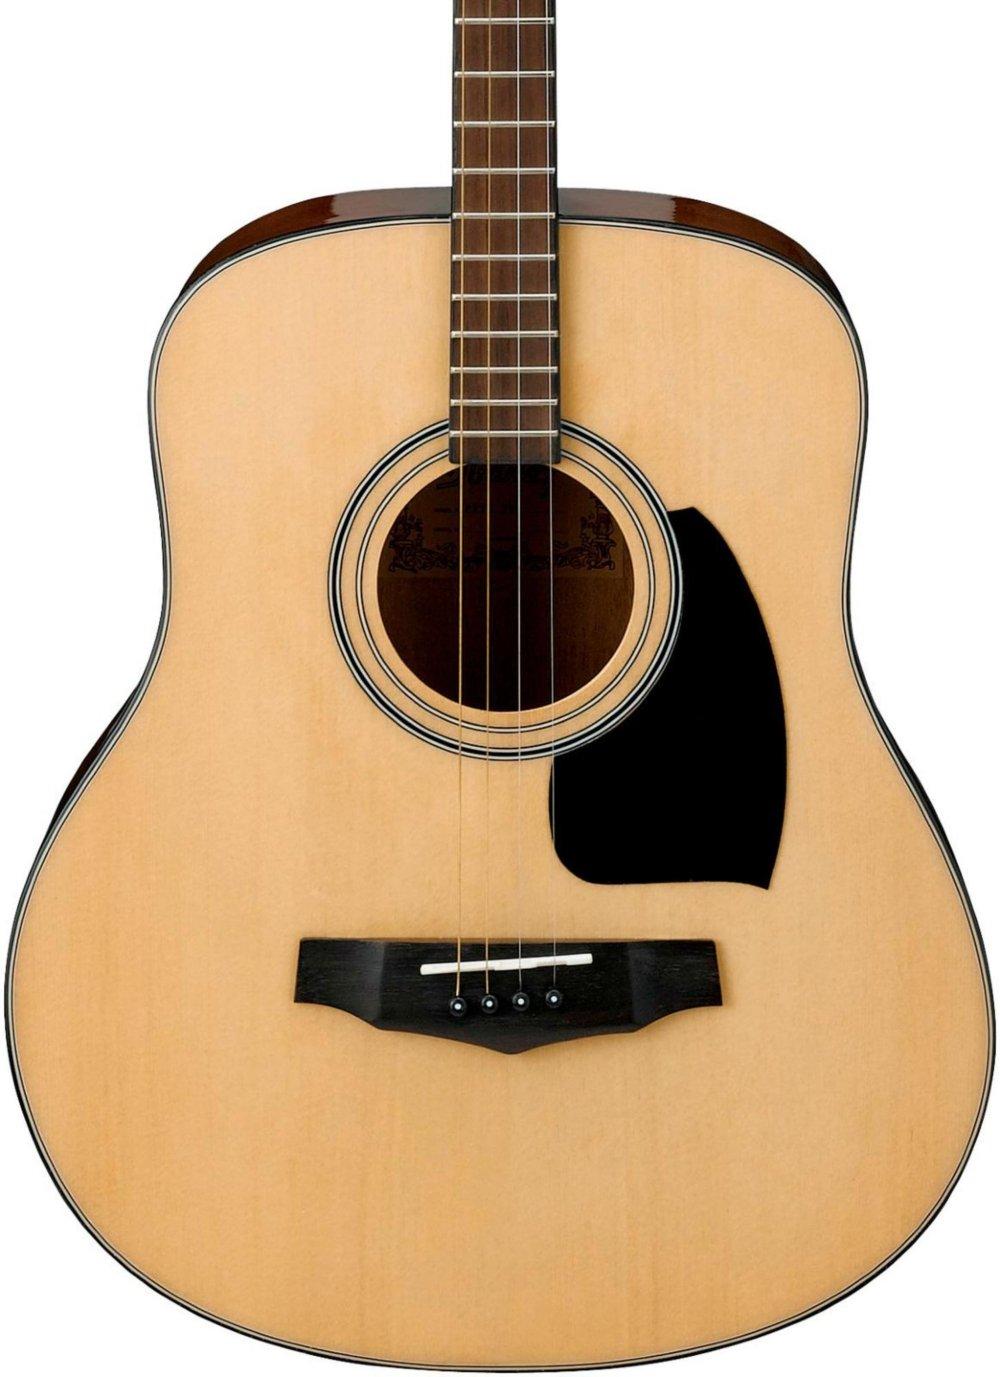 Ibanez アイバニーズ Performance PFT2-NT Mini Dreadnought Acoustic Tenor Guitar Natural アコースティックギター アコギ ギター (並行輸入) B00S9PEEA0